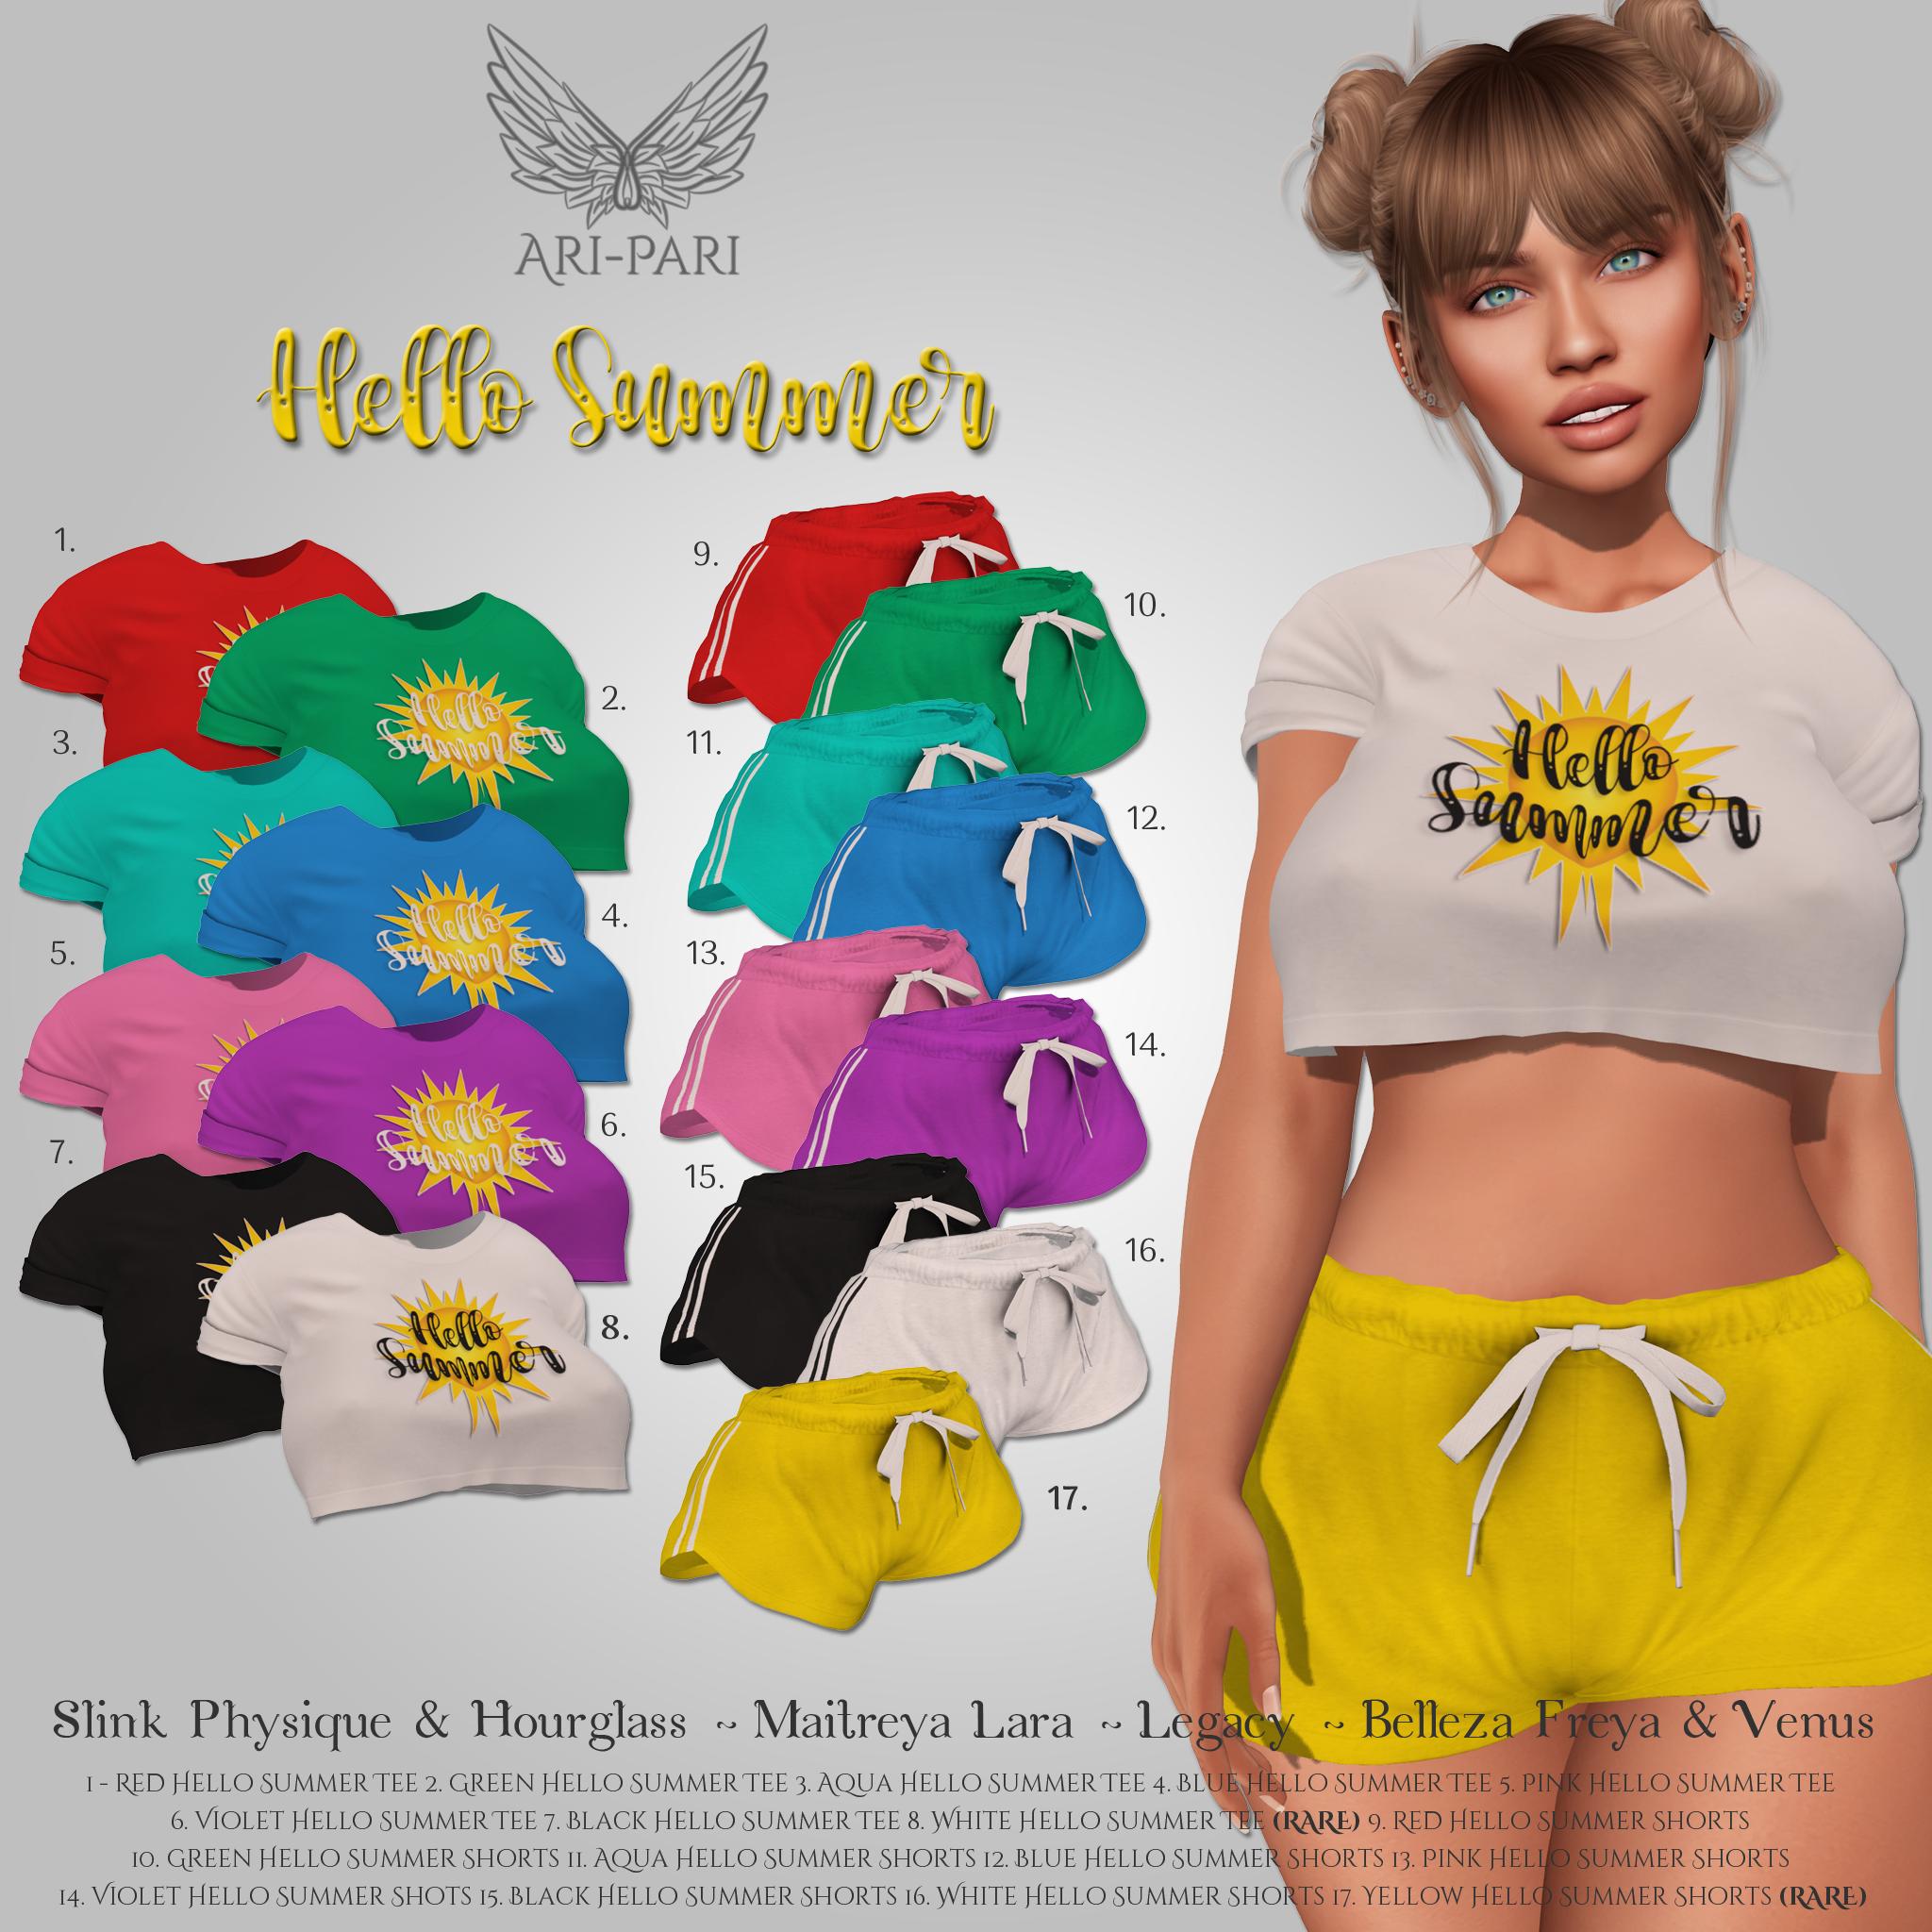 [Ari-Pari] Hello Summer Gacha